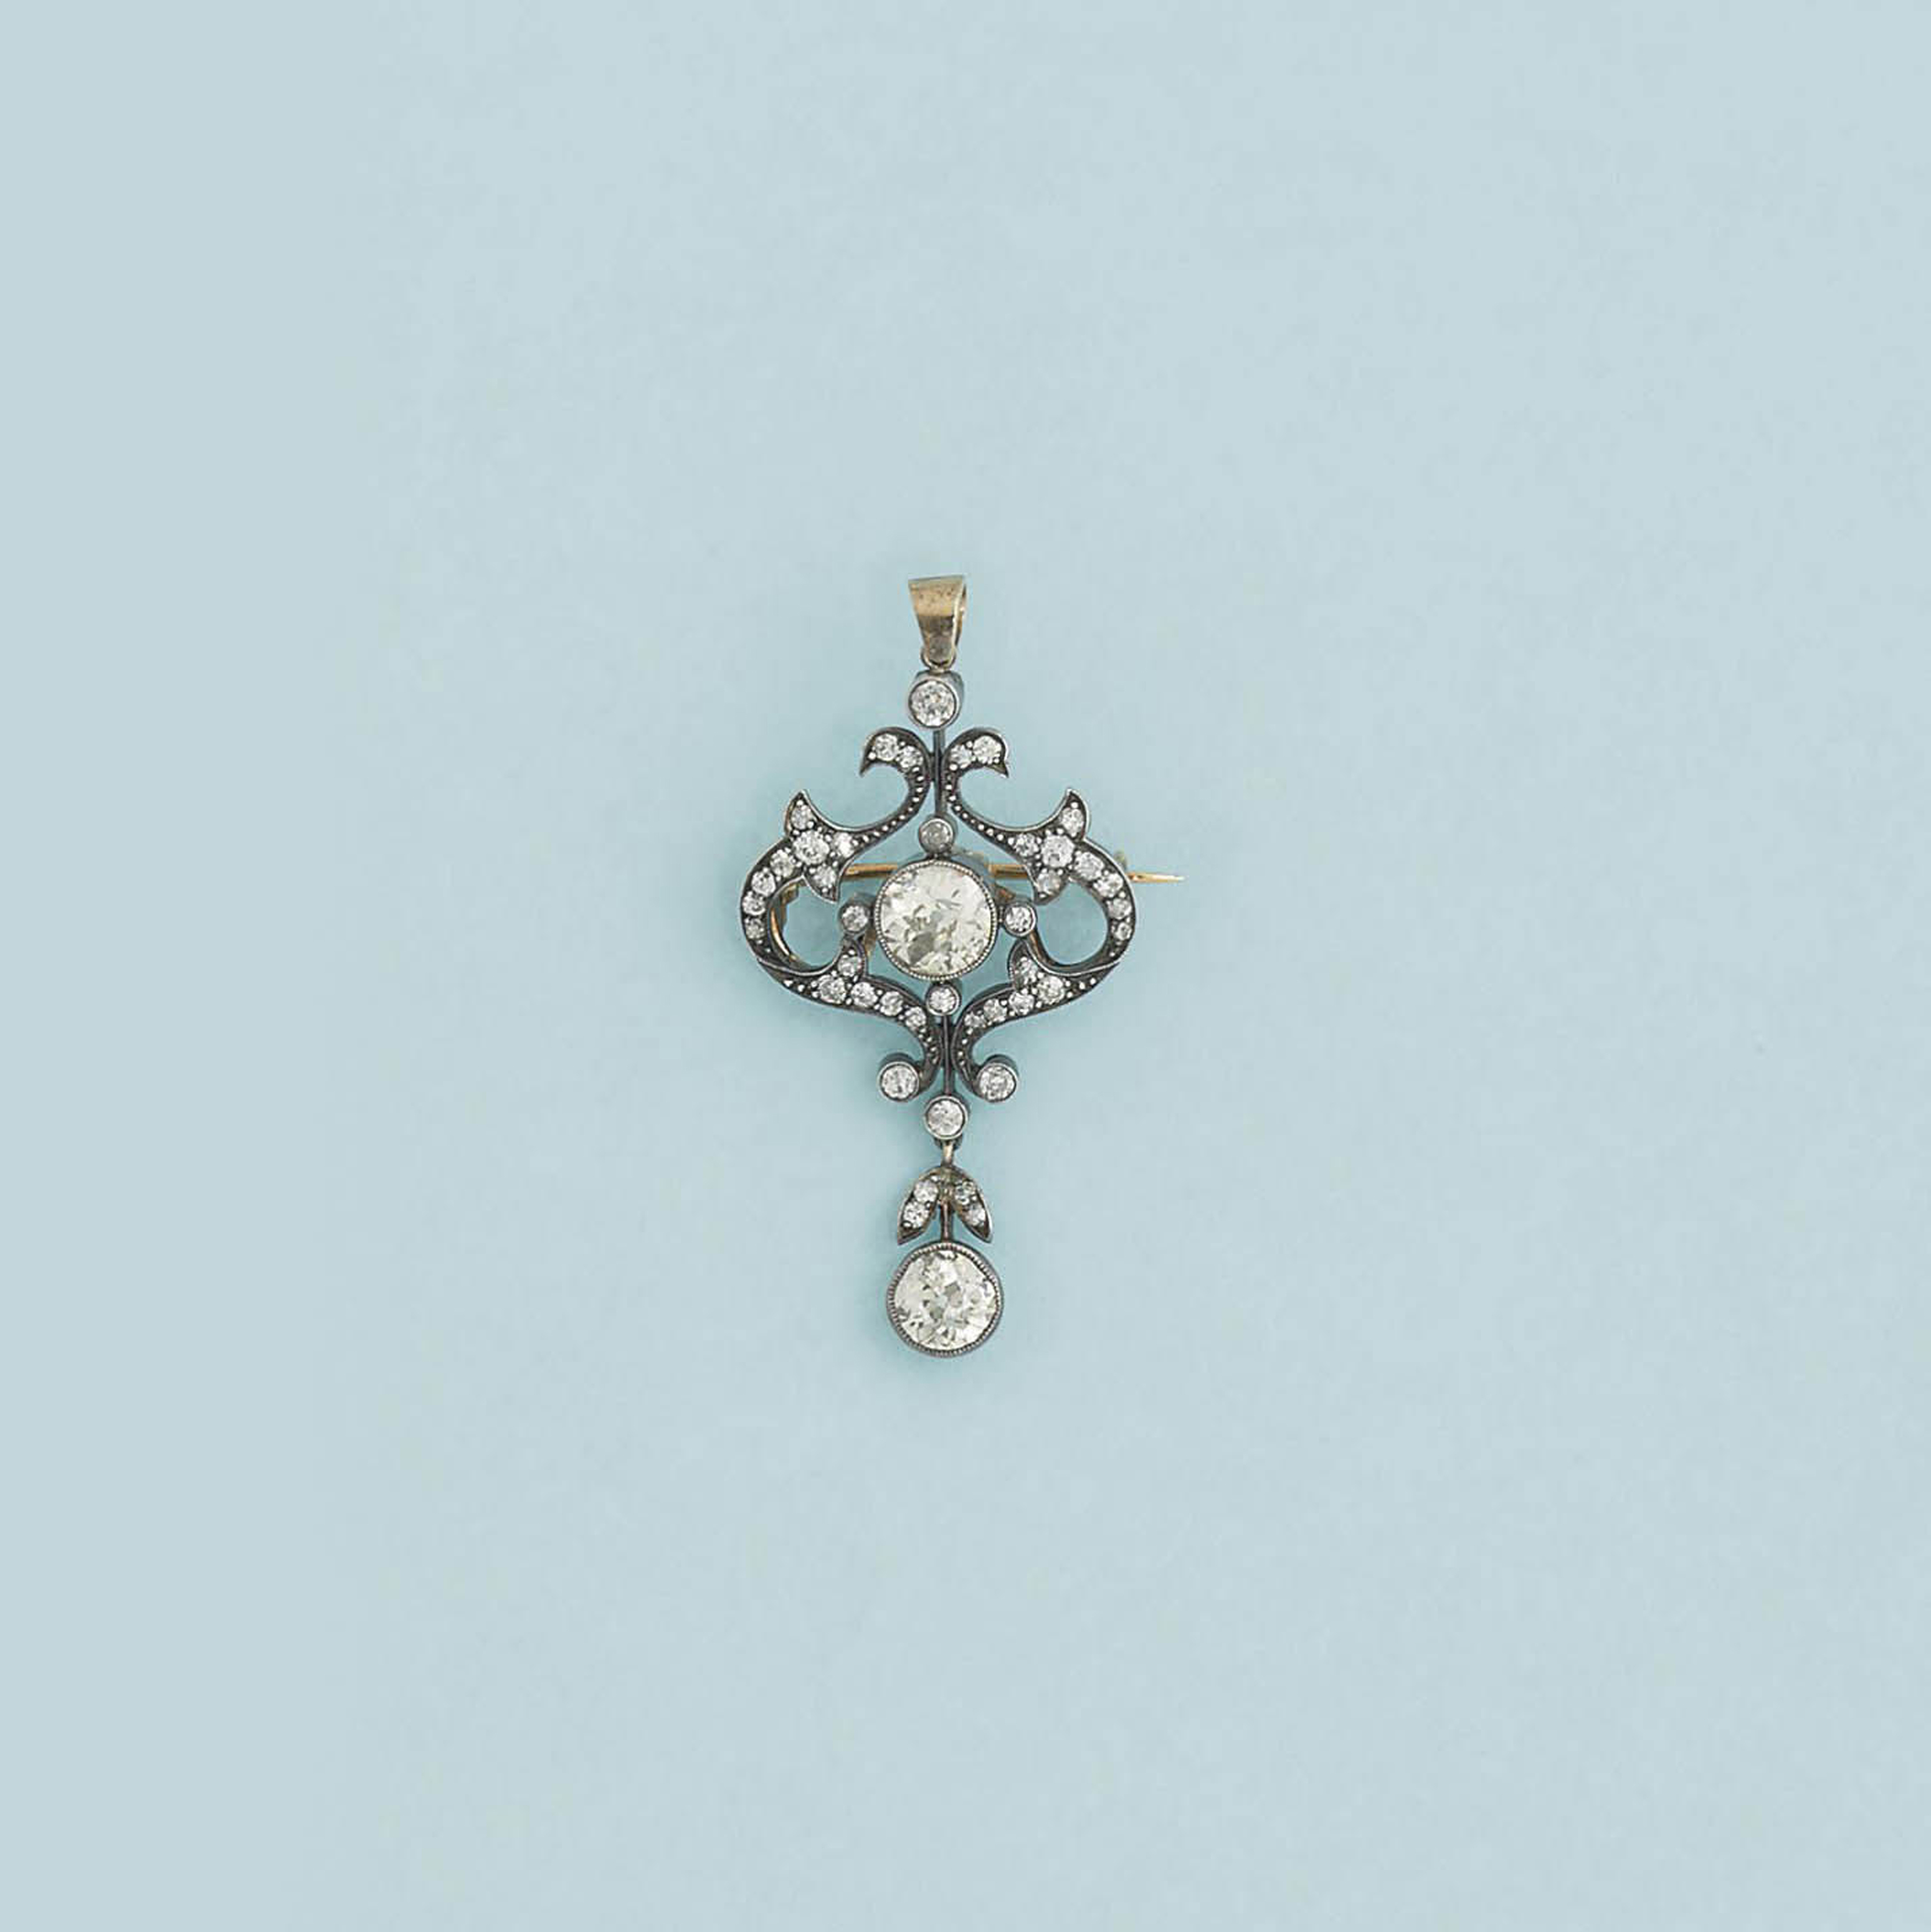 A late 19th century diamond brooch/pendant